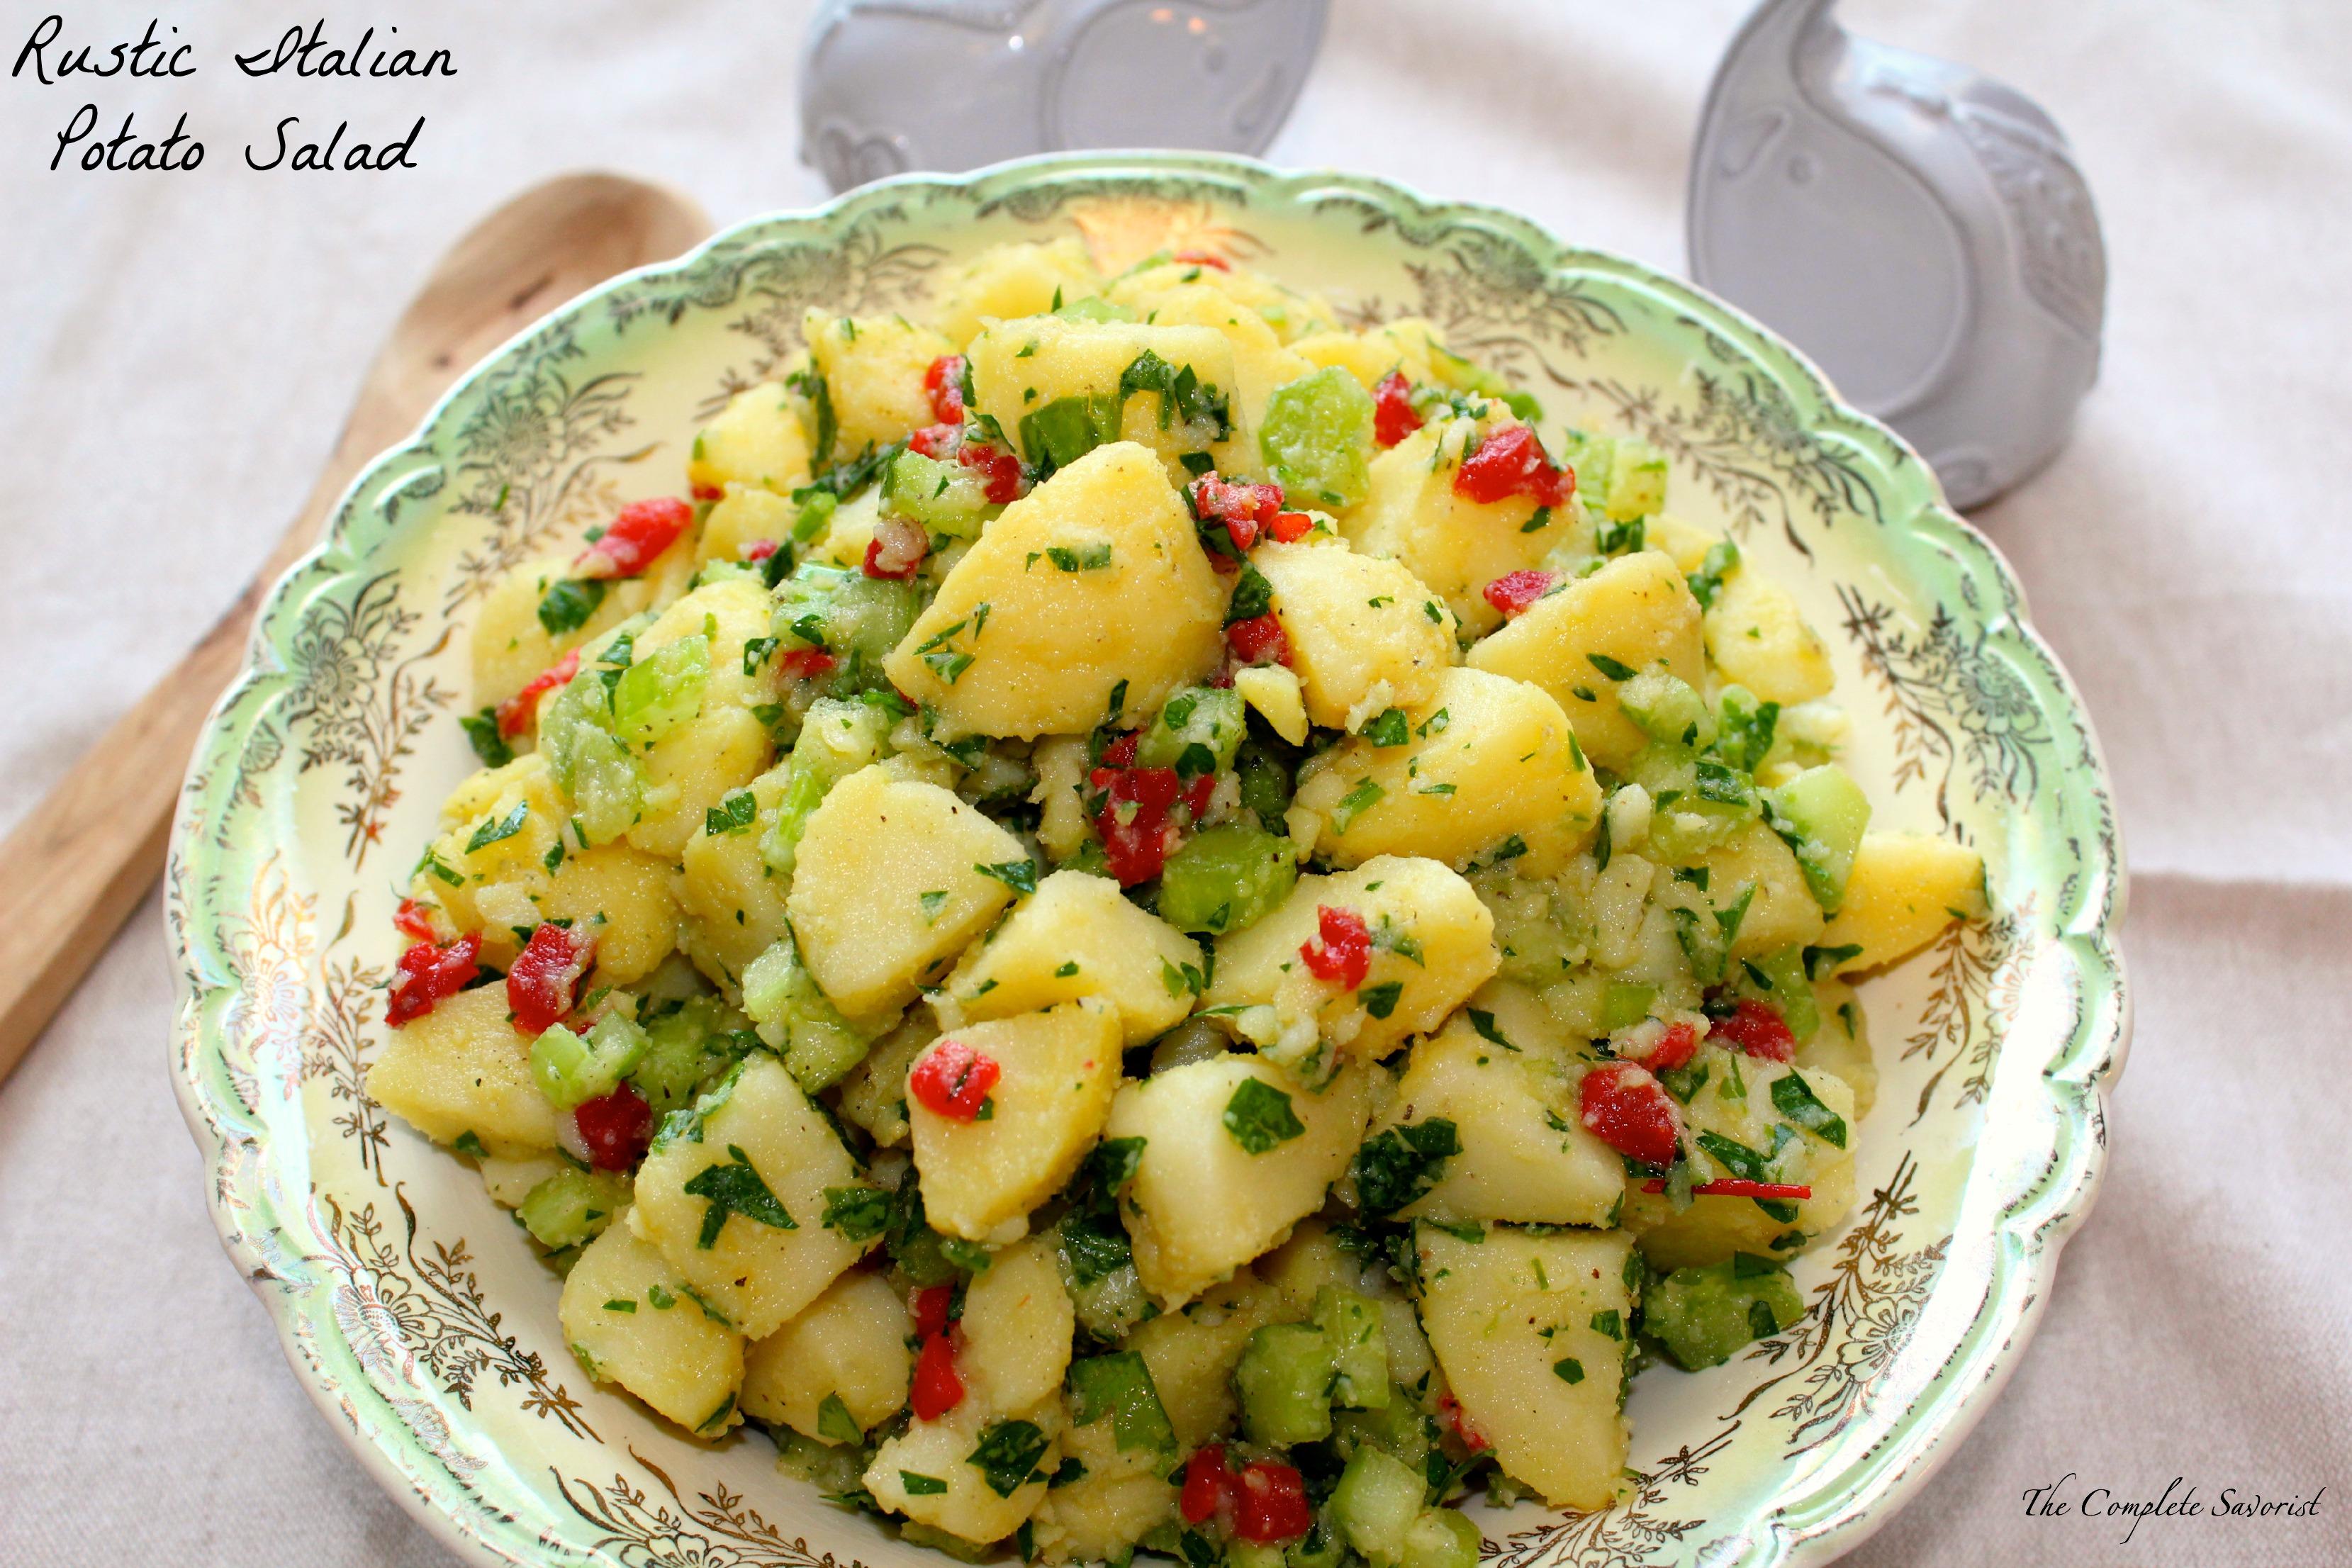 Rustic Italian Potato Salad